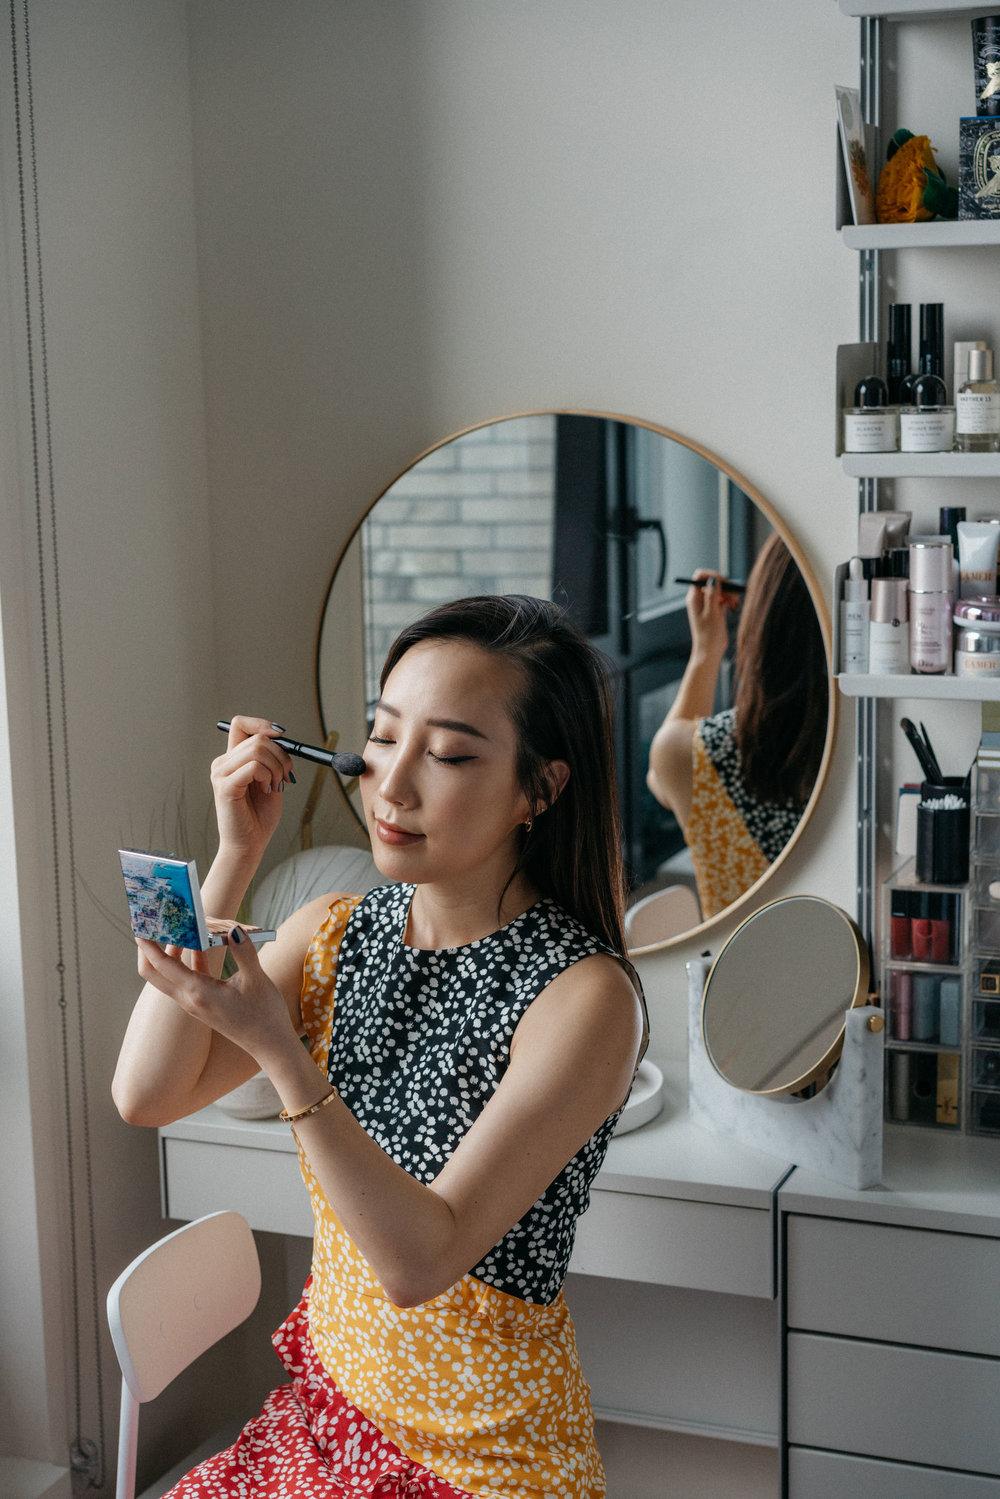 Applying the  Chantecaille Sirena Bronzer